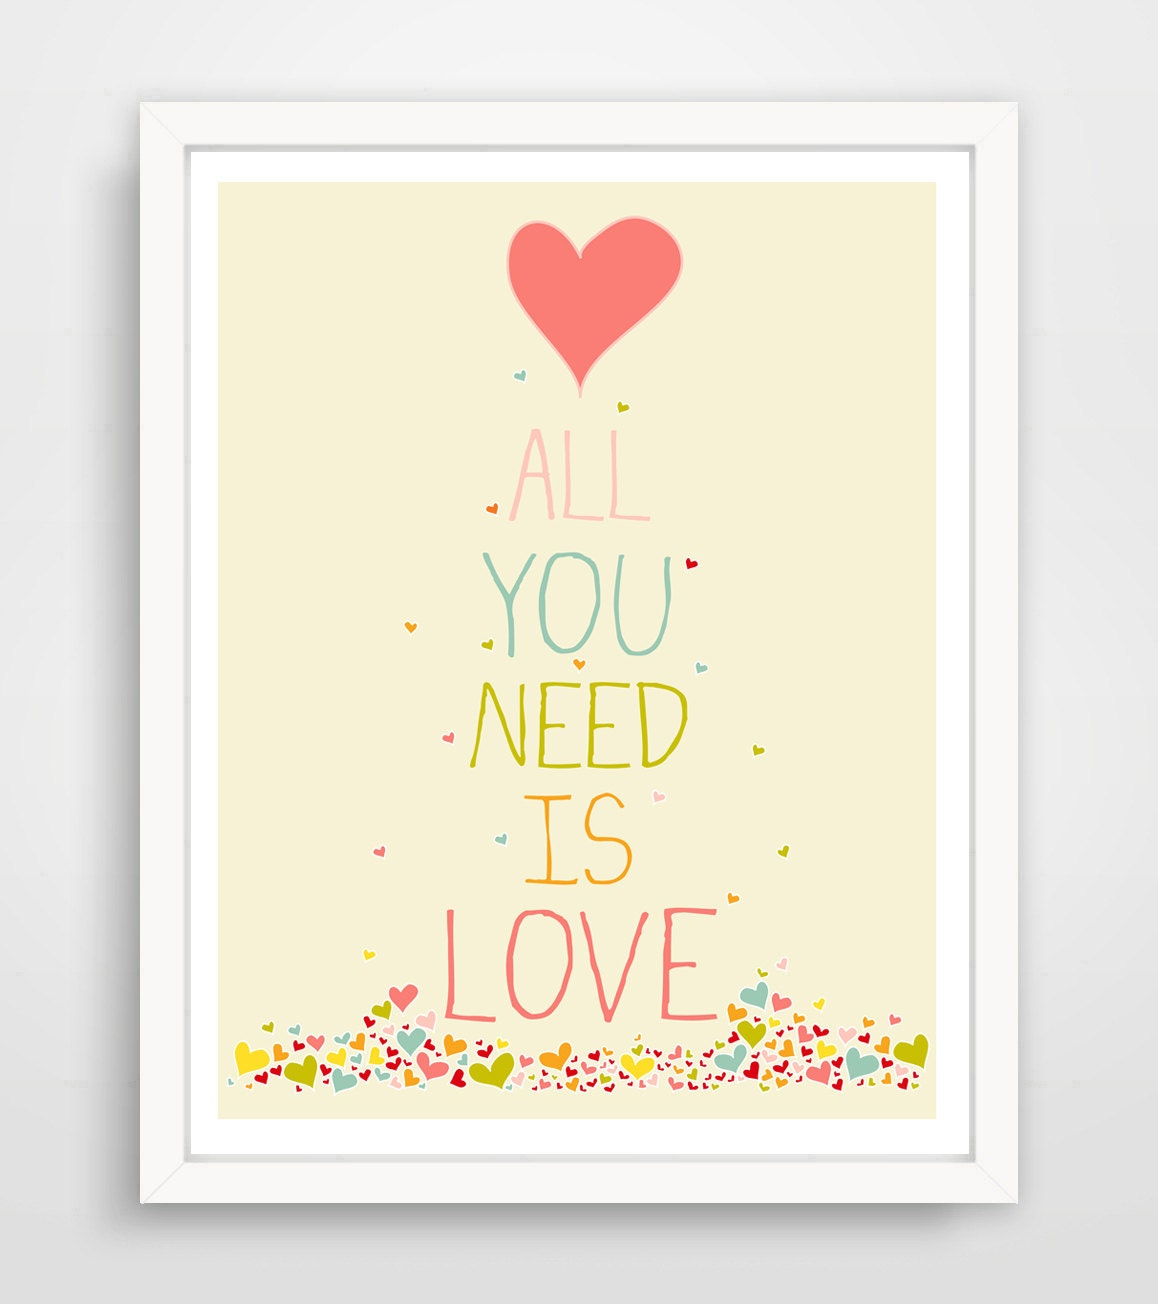 Wall Art Love Hearts : All you need is love print heart wall art decor